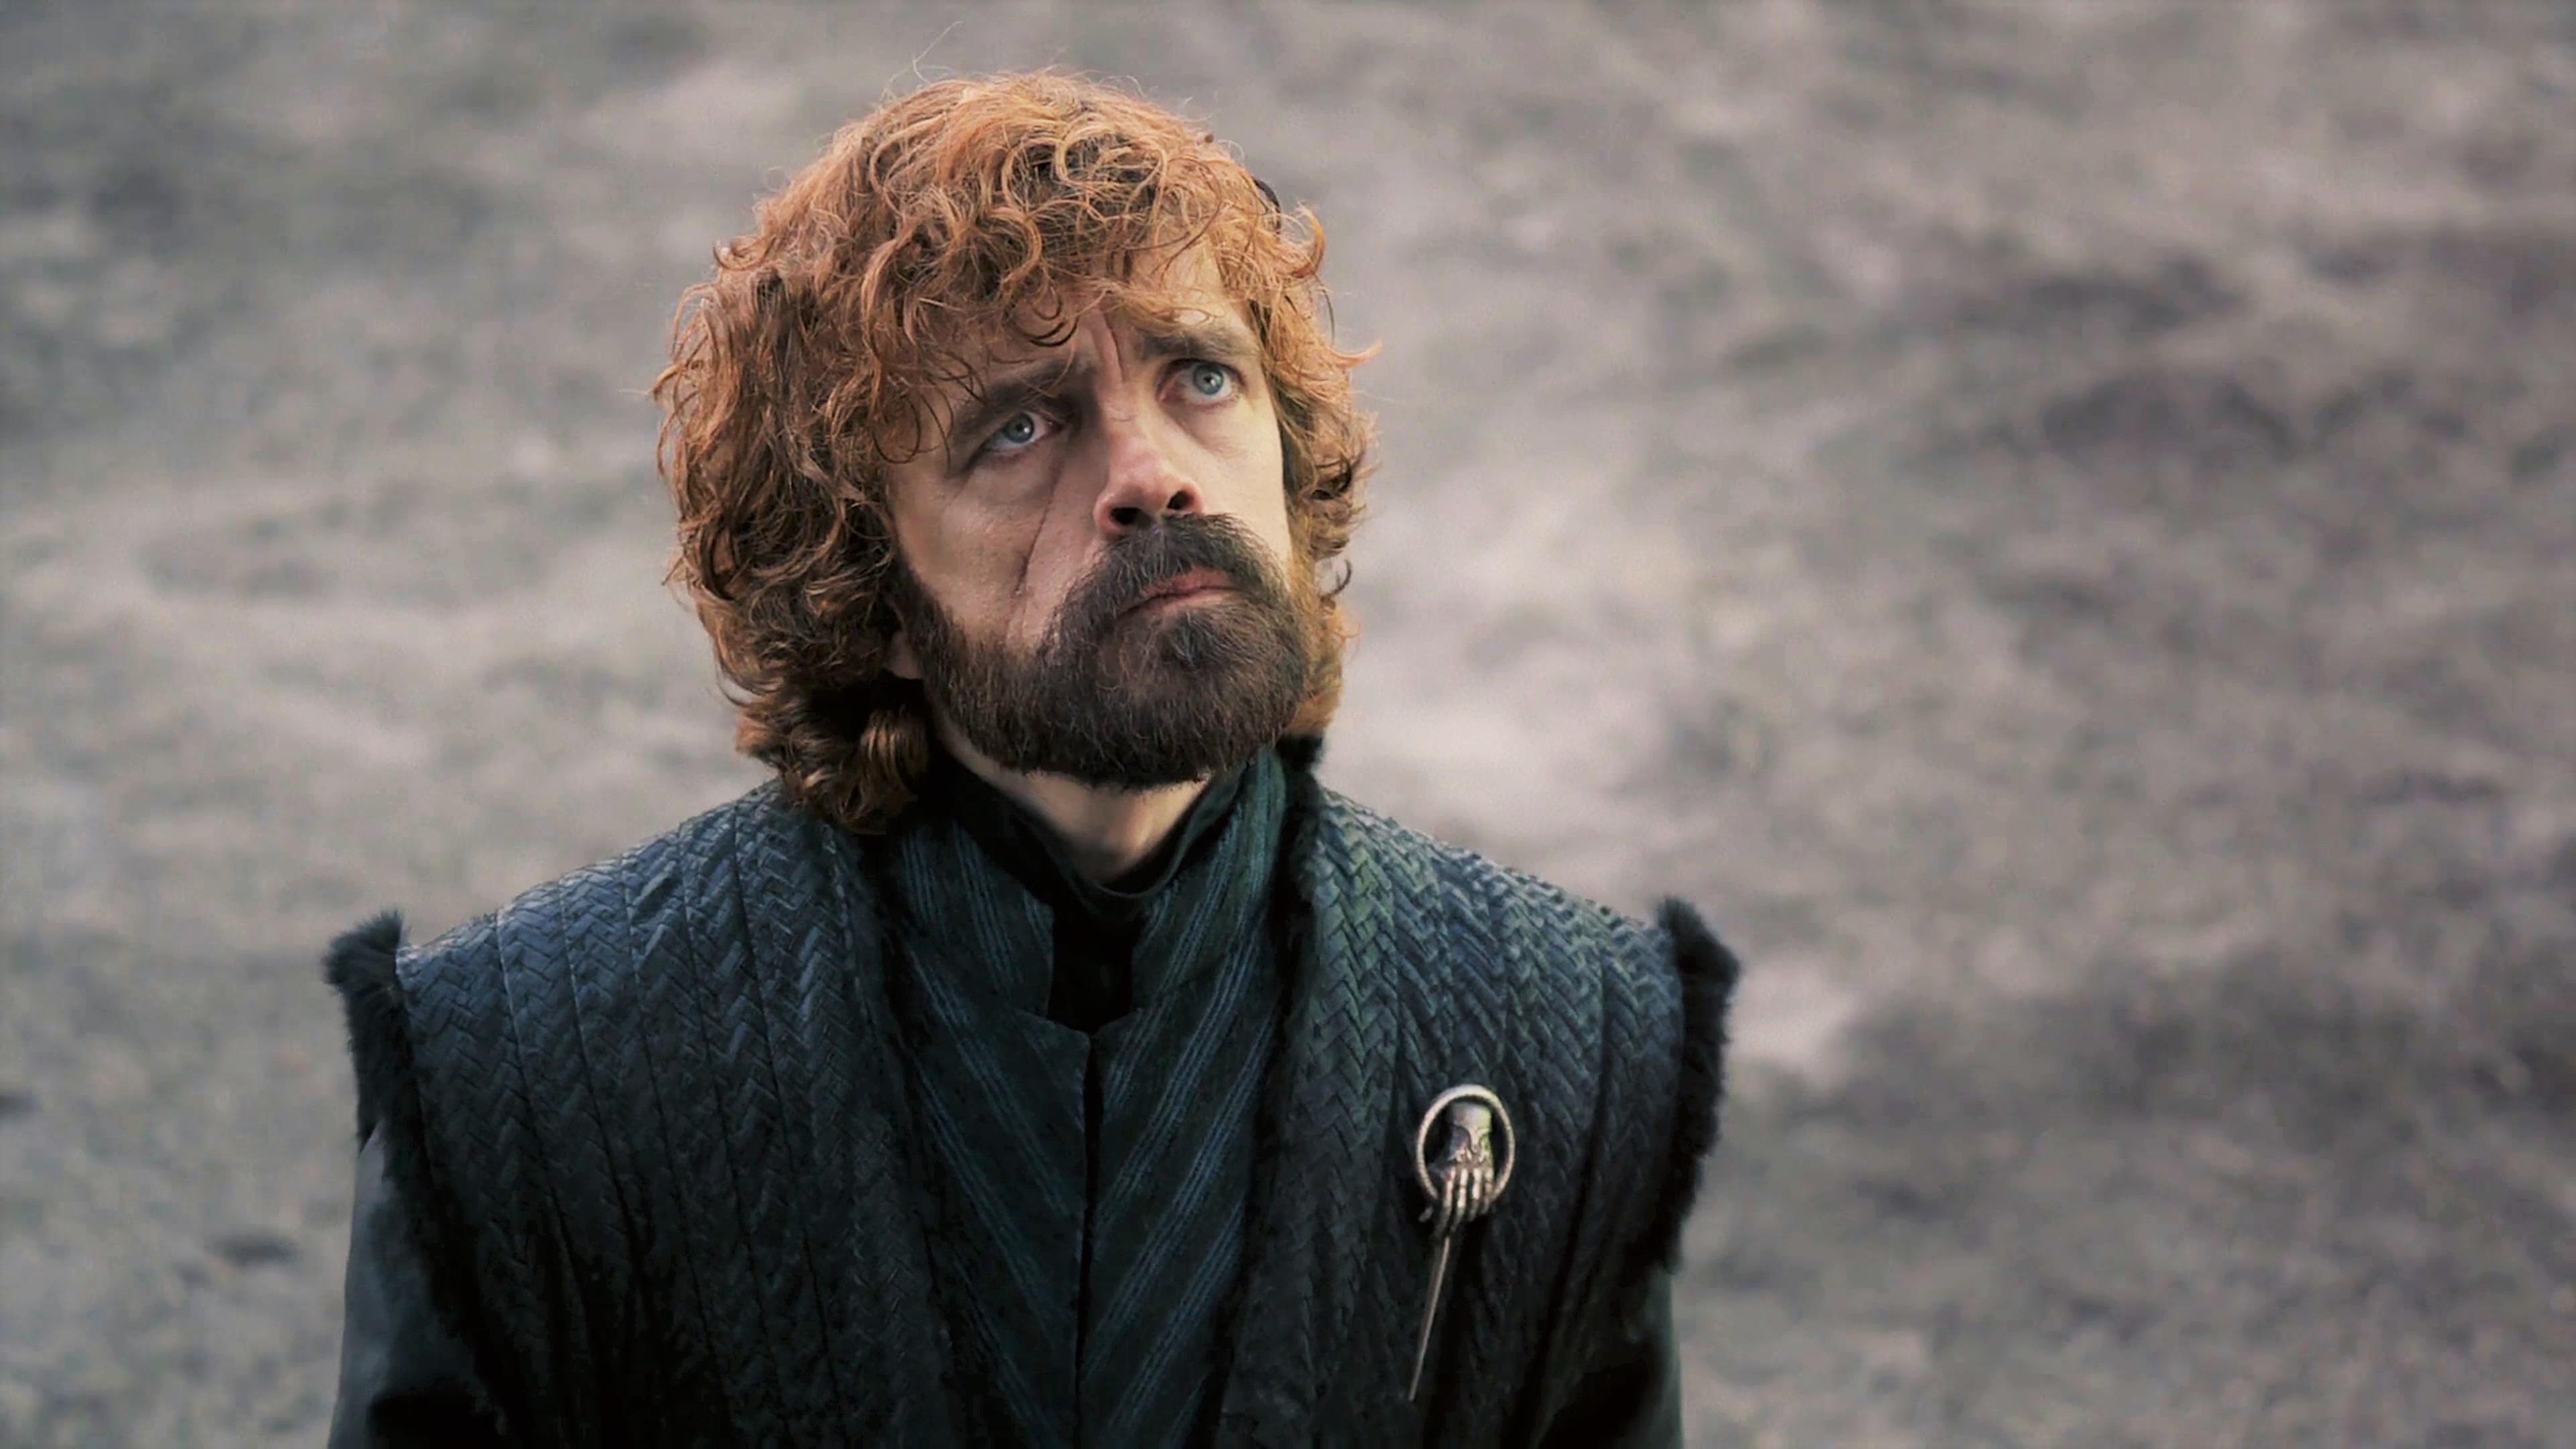 43. Season 8 Trailer Tyrion